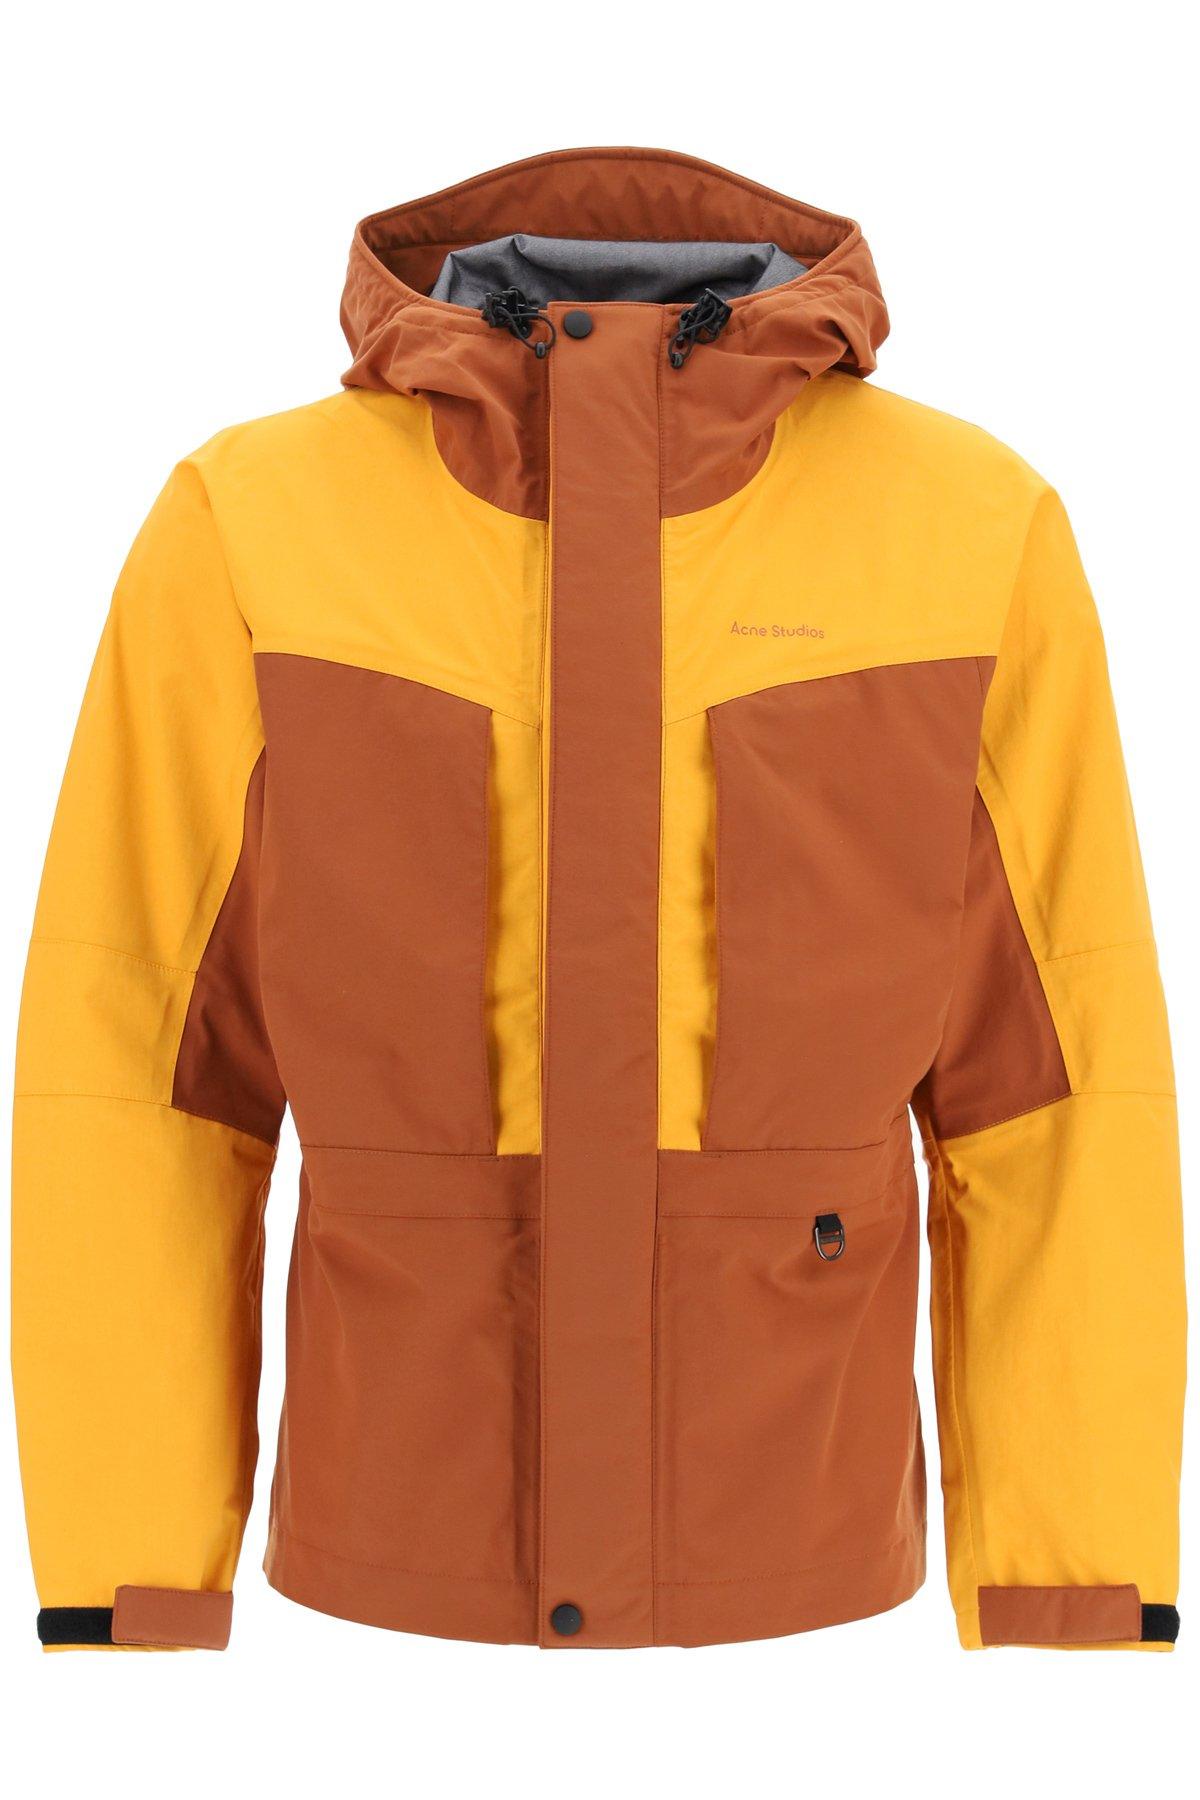 Acne studios anorak jacket bicolore